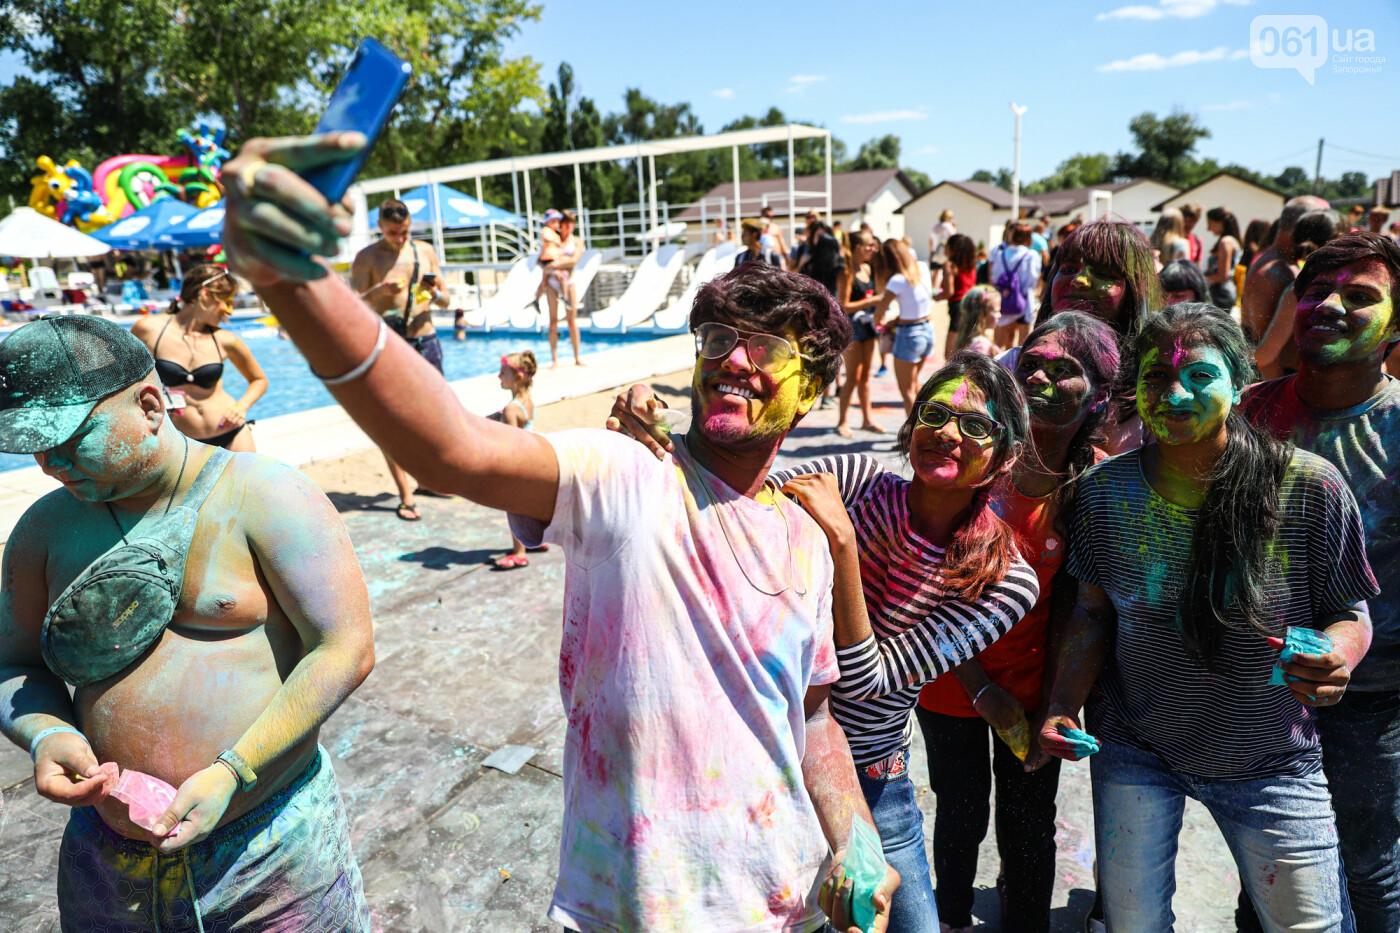 Сотни запорожцев приняли участие в фестивале красок Холи, - ФОТОРЕПОРТАЖ, фото-6